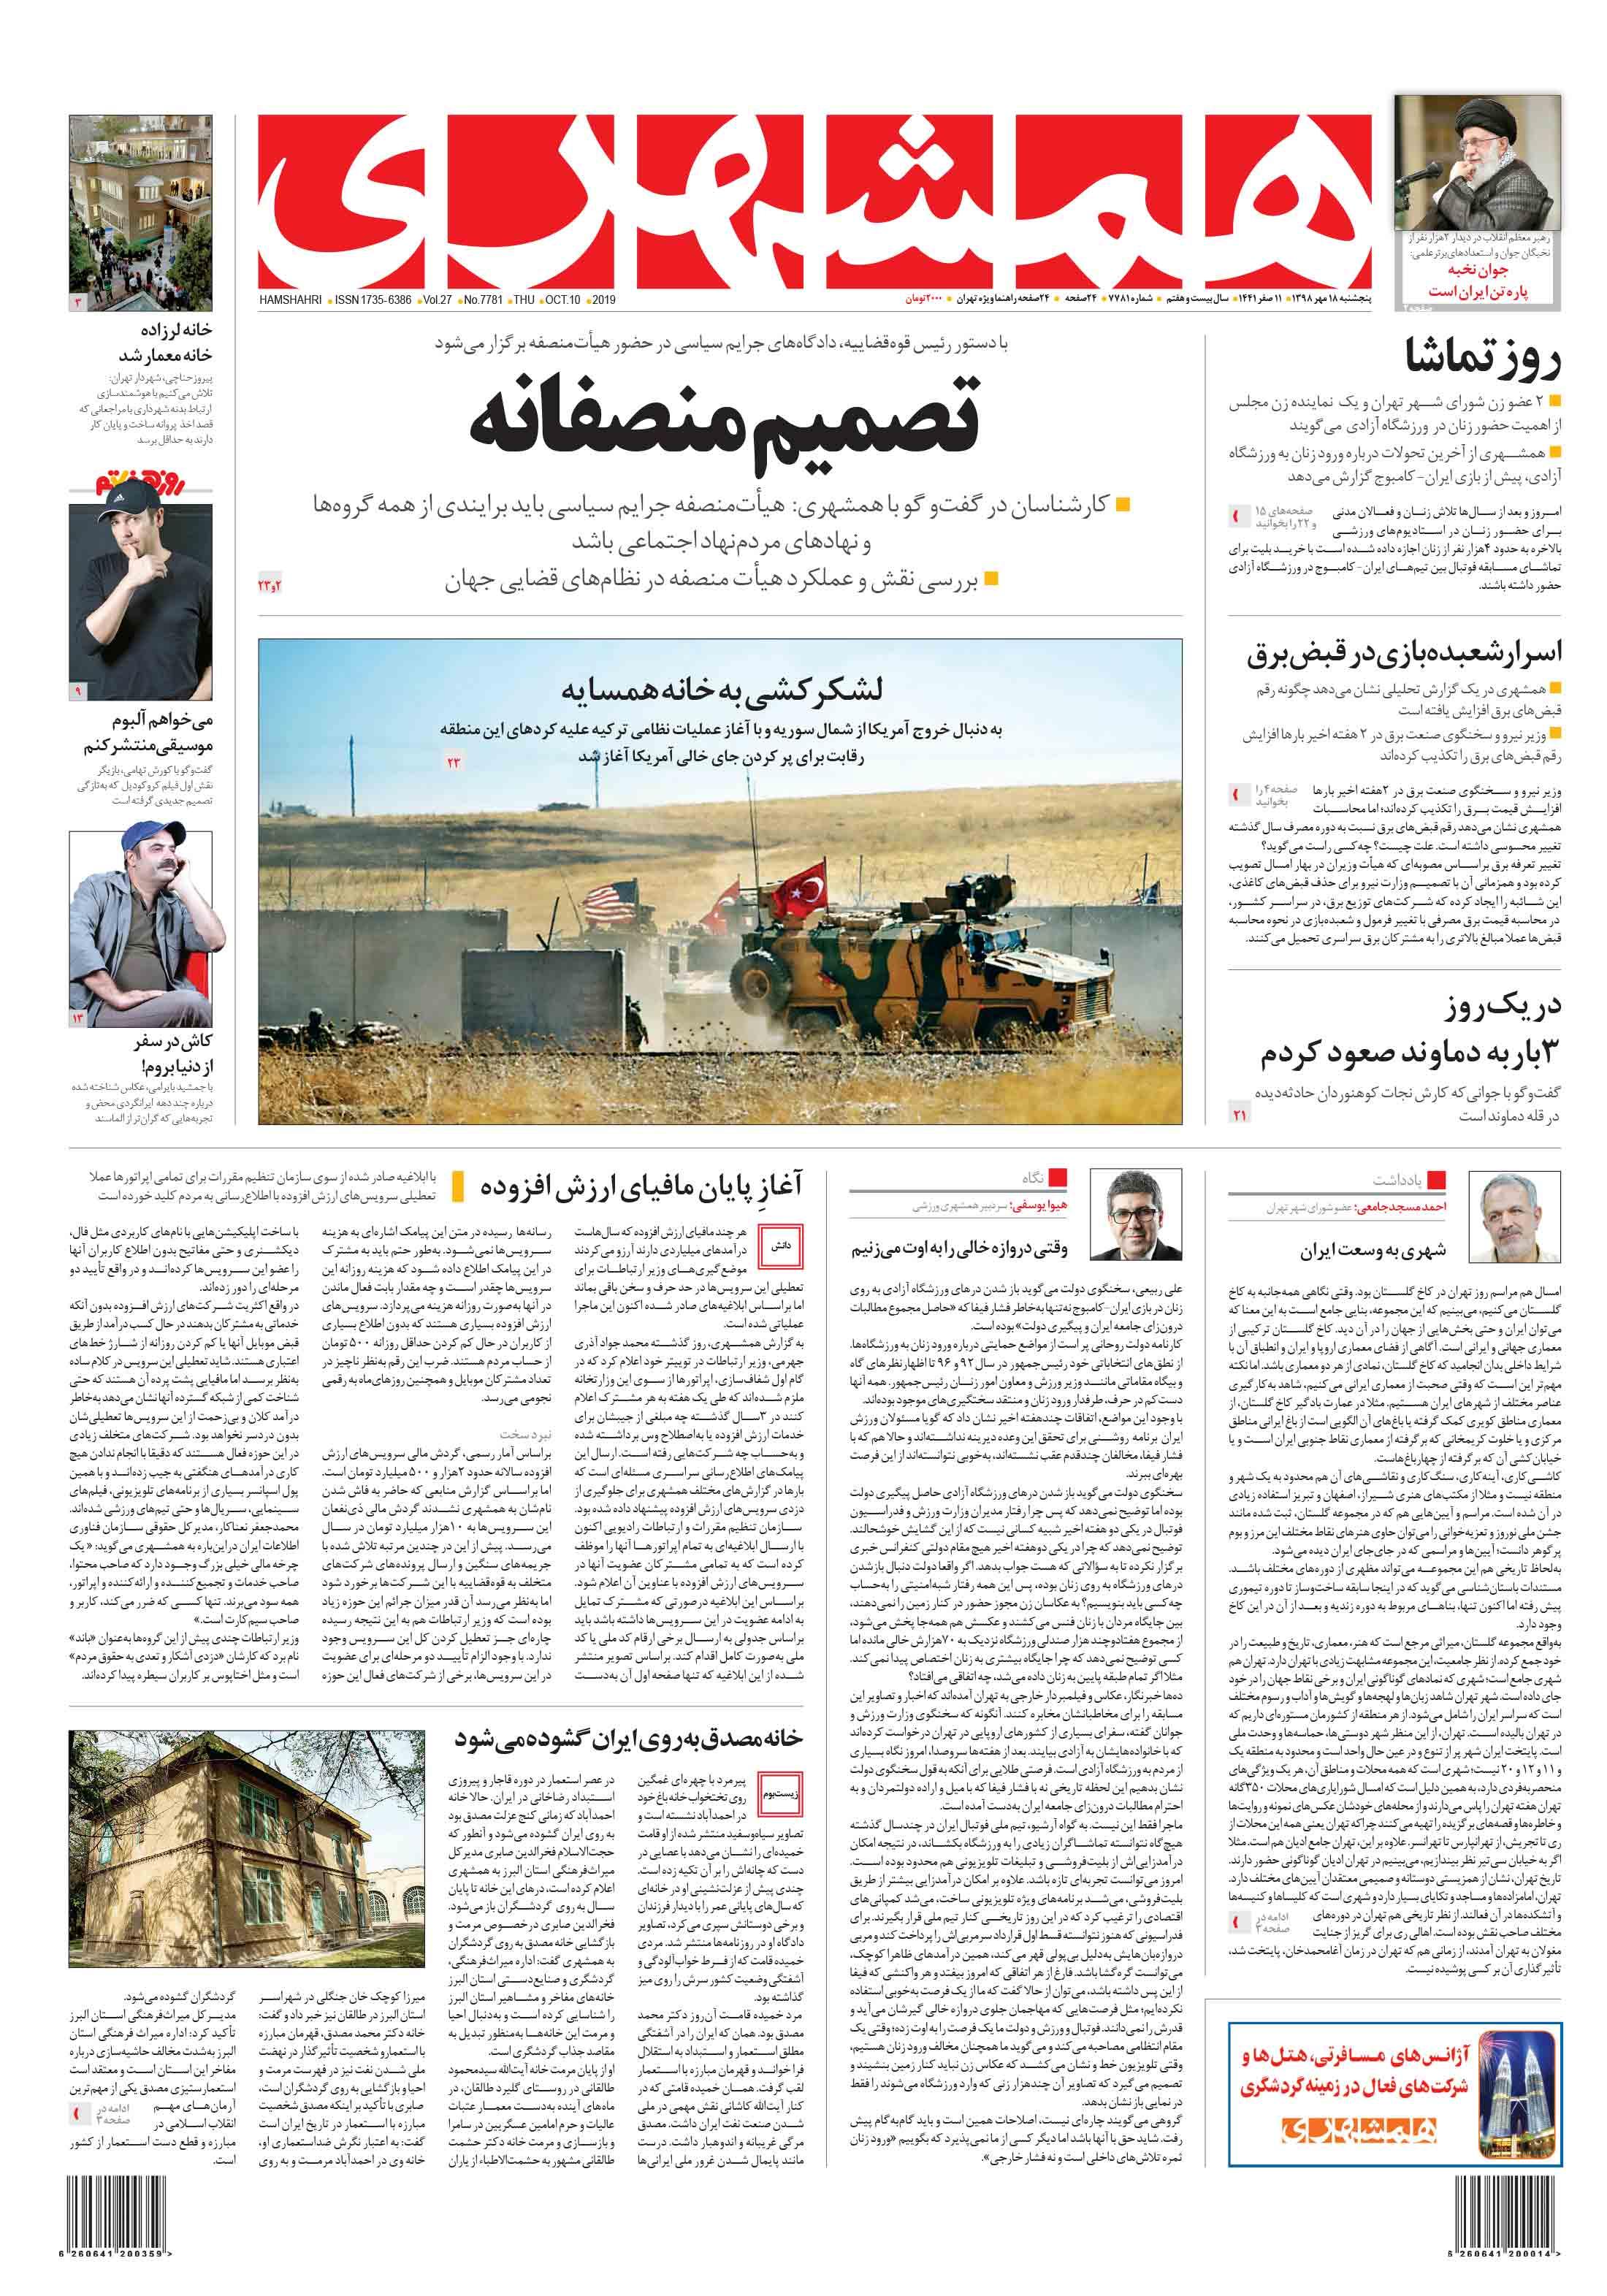 صفحه اول پنج شنبه 18 مهر 1398